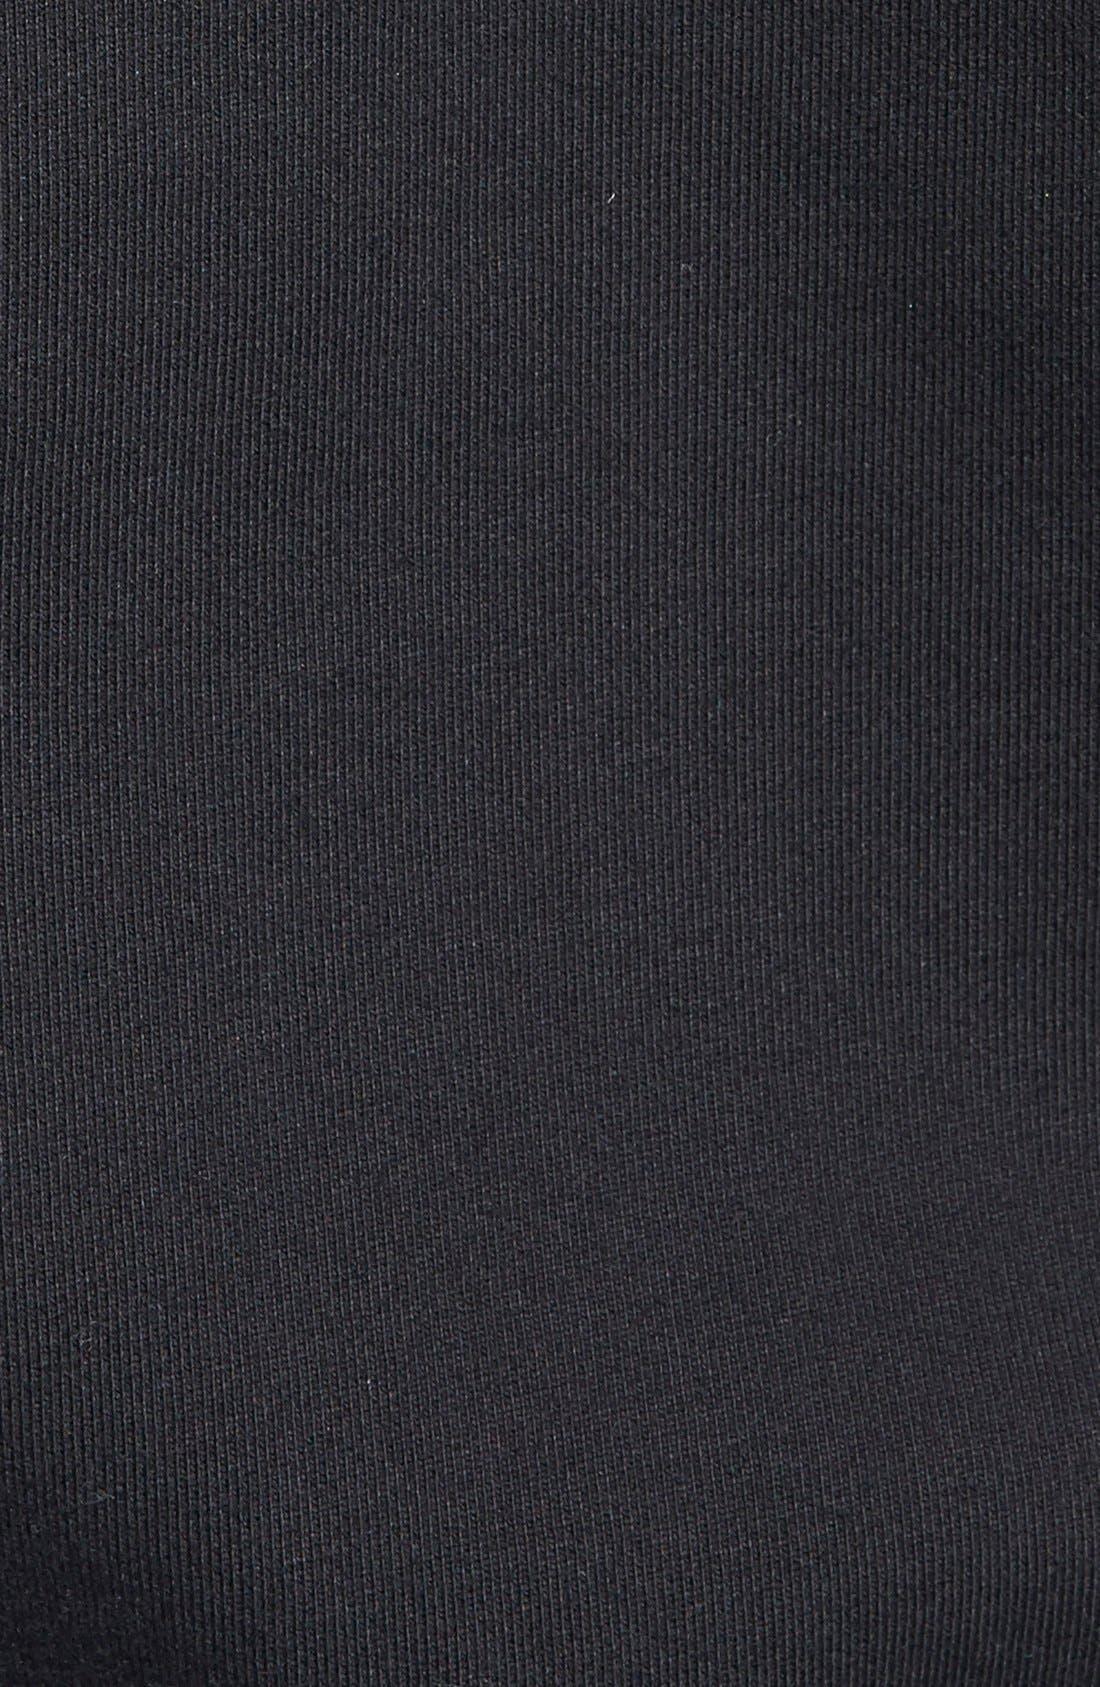 Core Zip Front Hoodie,                             Alternate thumbnail 5, color,                             Black